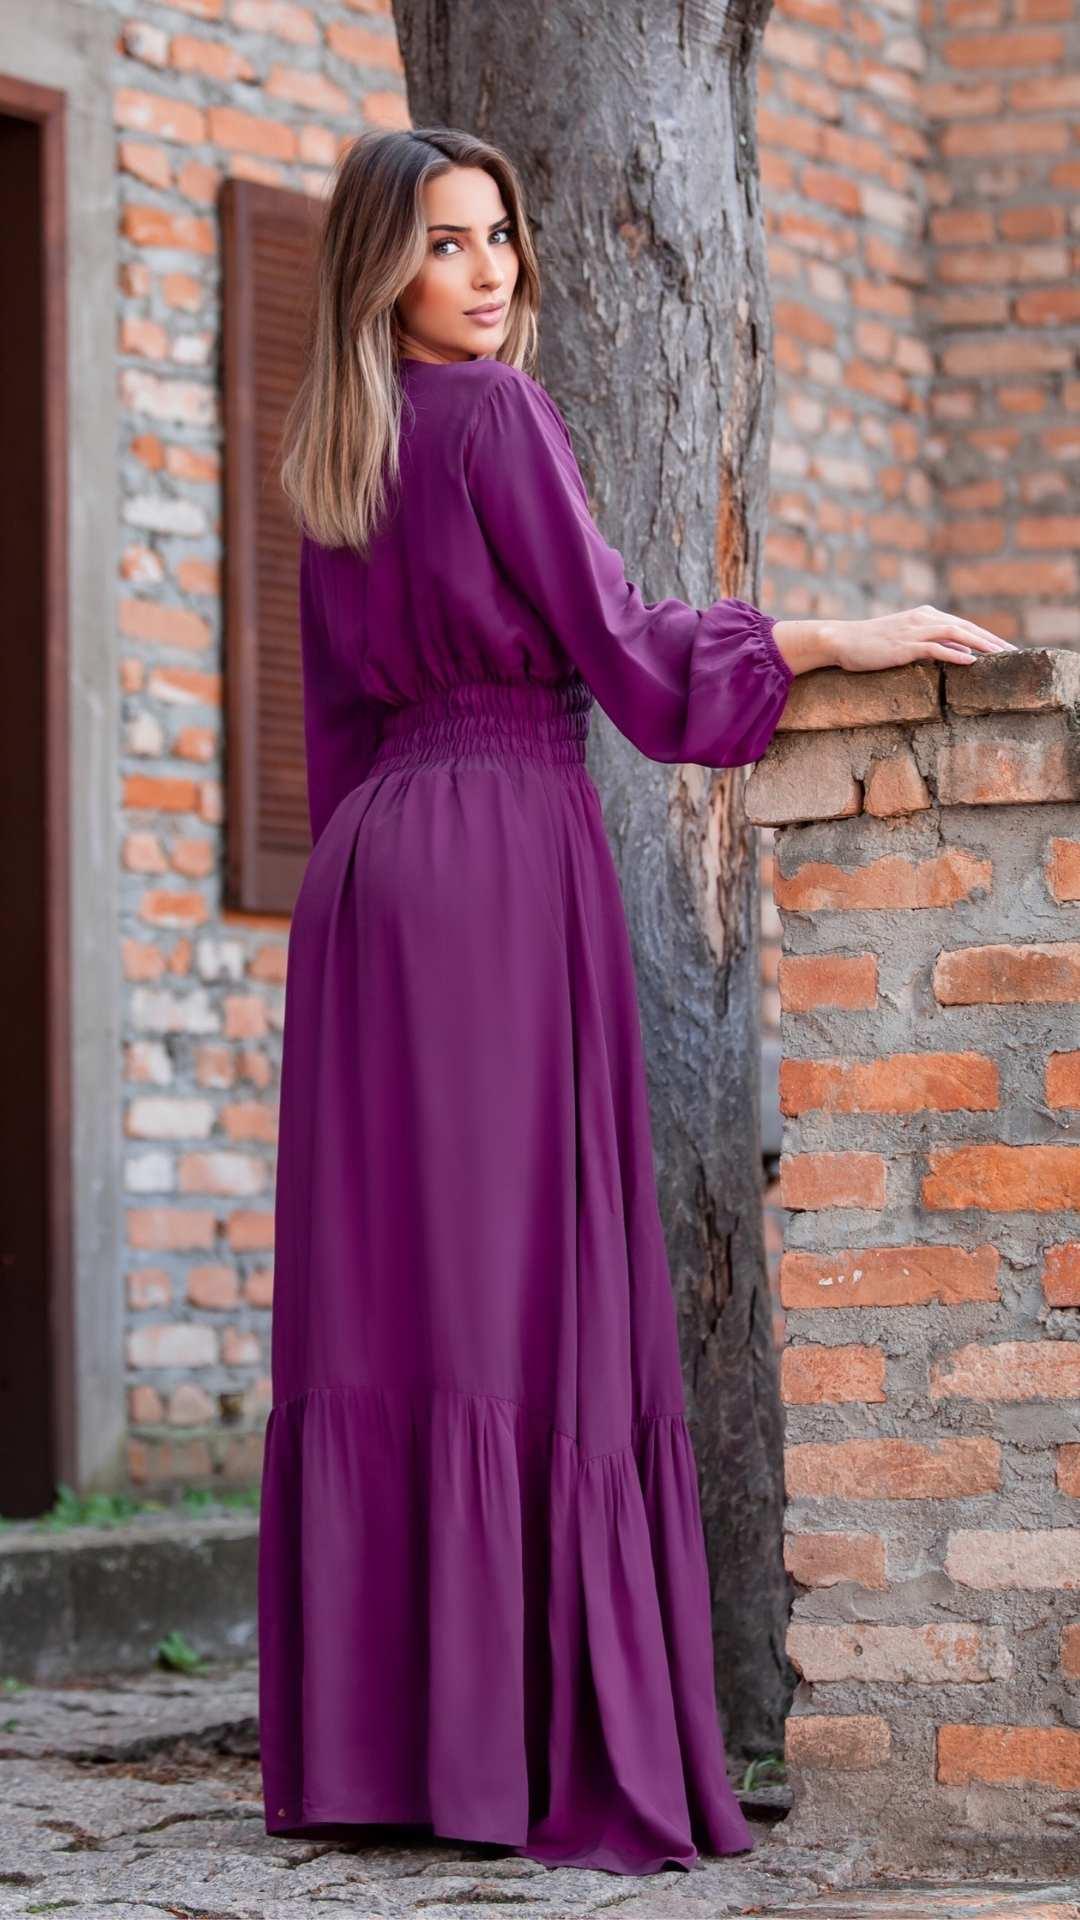 Vestido Longo Transpasse Lastex Viscose Uva